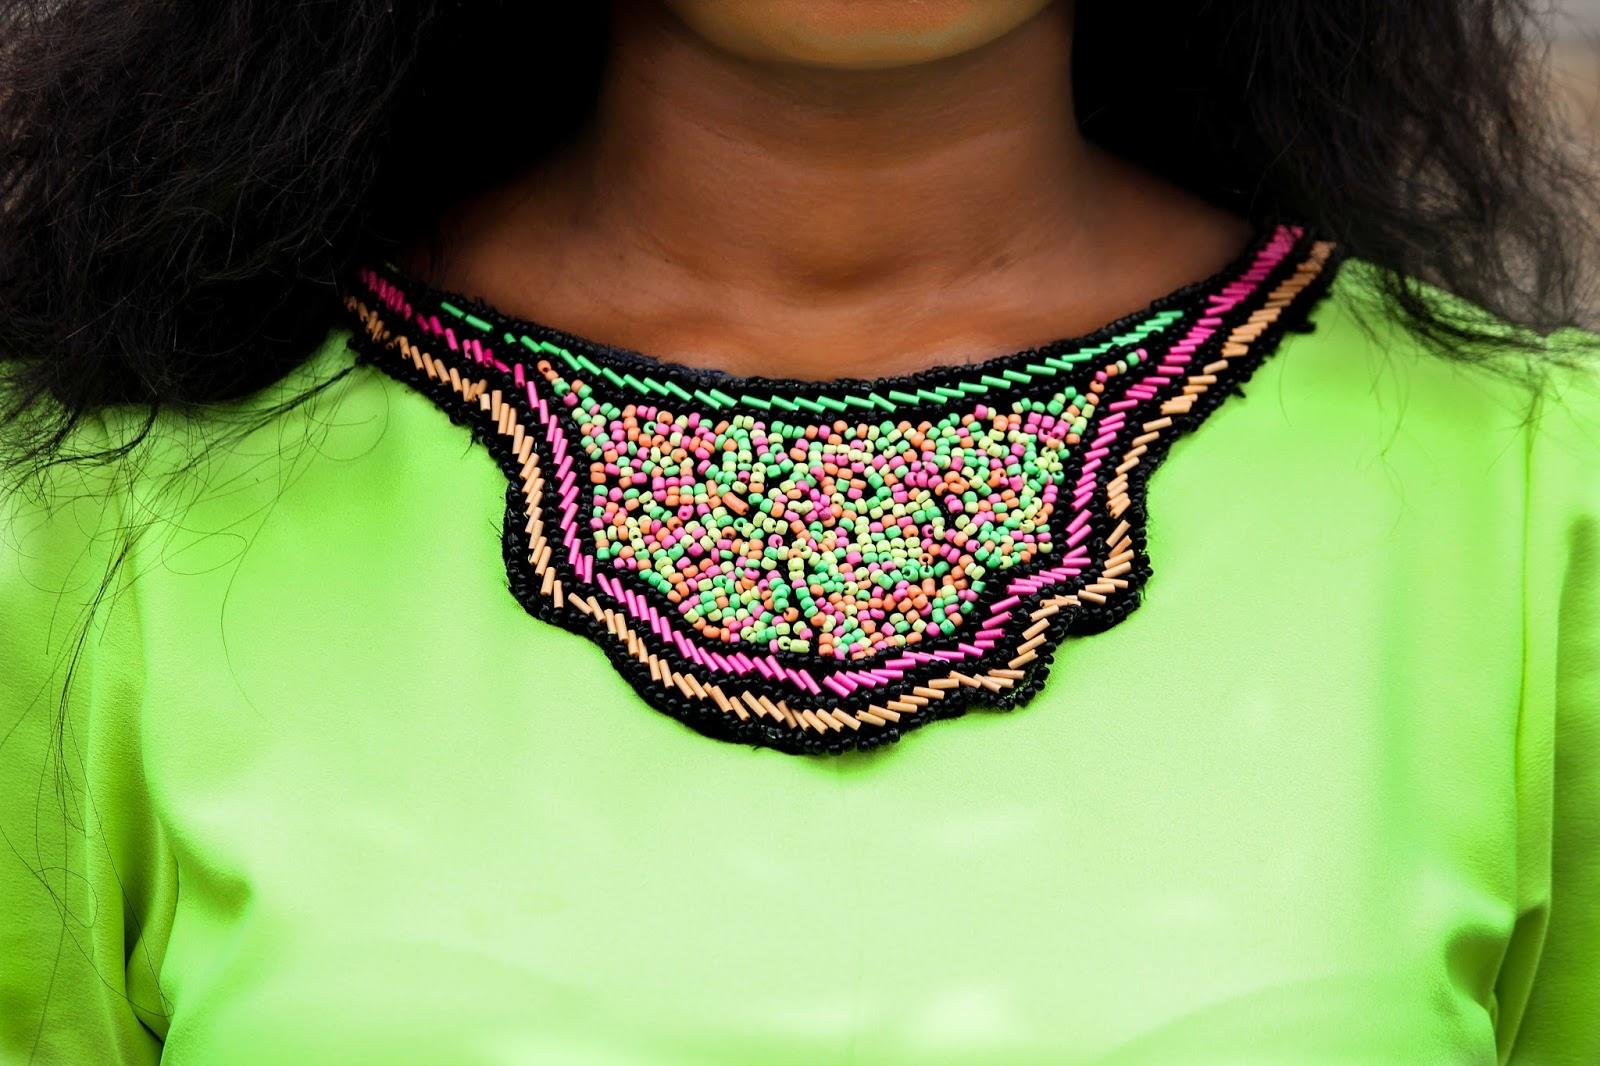 NEON HI-LO SHIFT DRESS - Neck Bead Detailing on Neon Shift Dress by Porshher